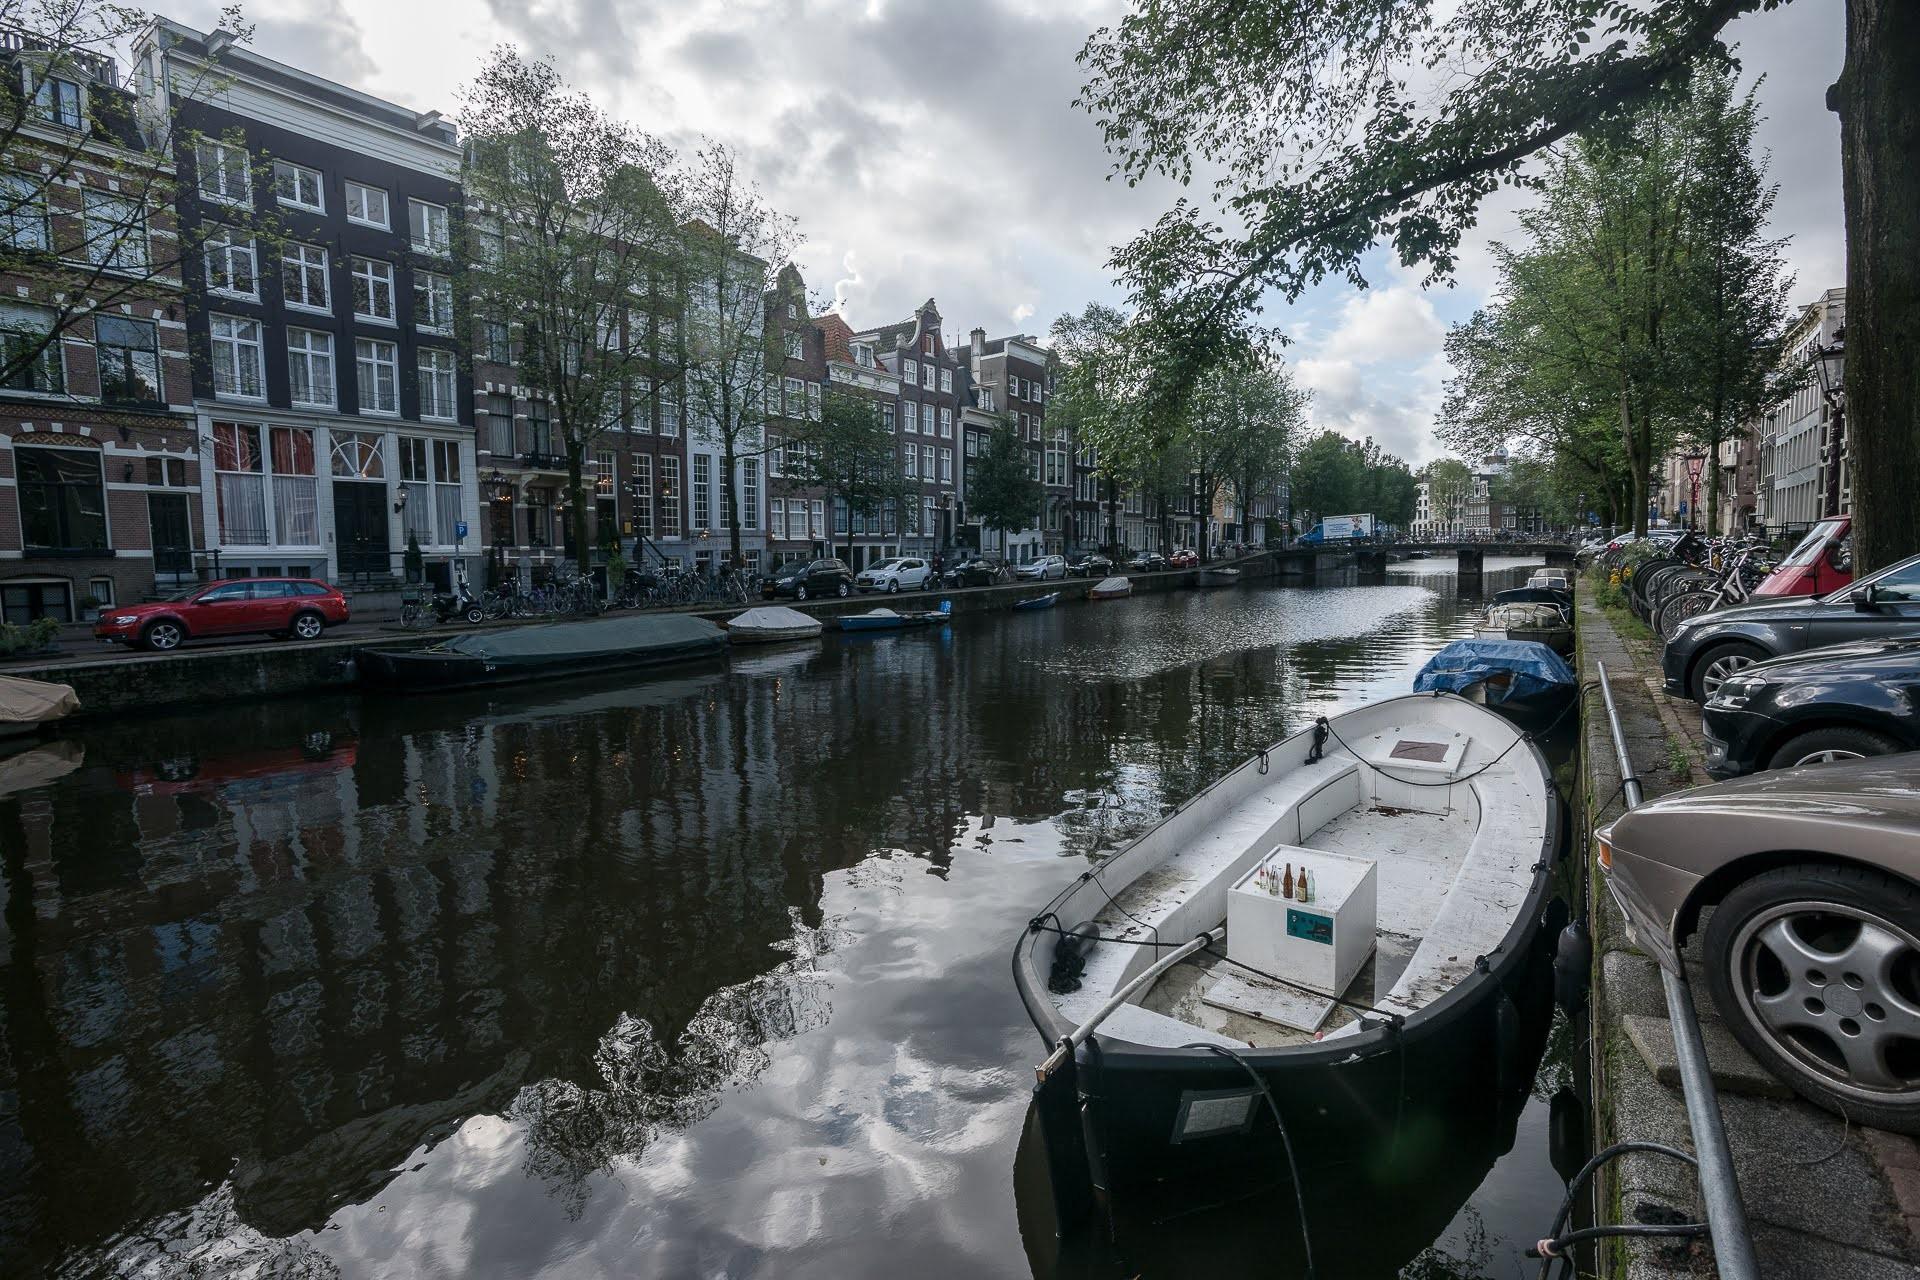 Amsterdam - Malajsie cestopis, Martin Šístek